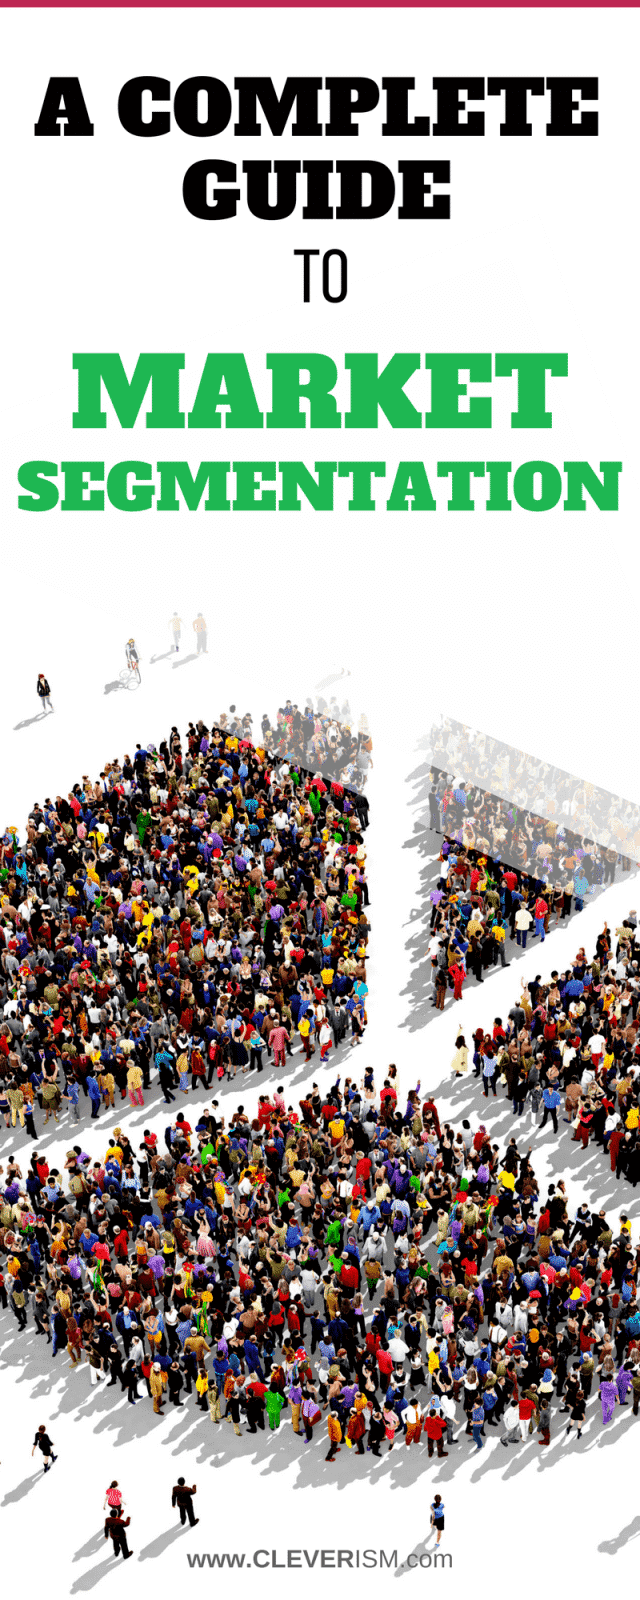 A Complete Guide to Market Segmentation